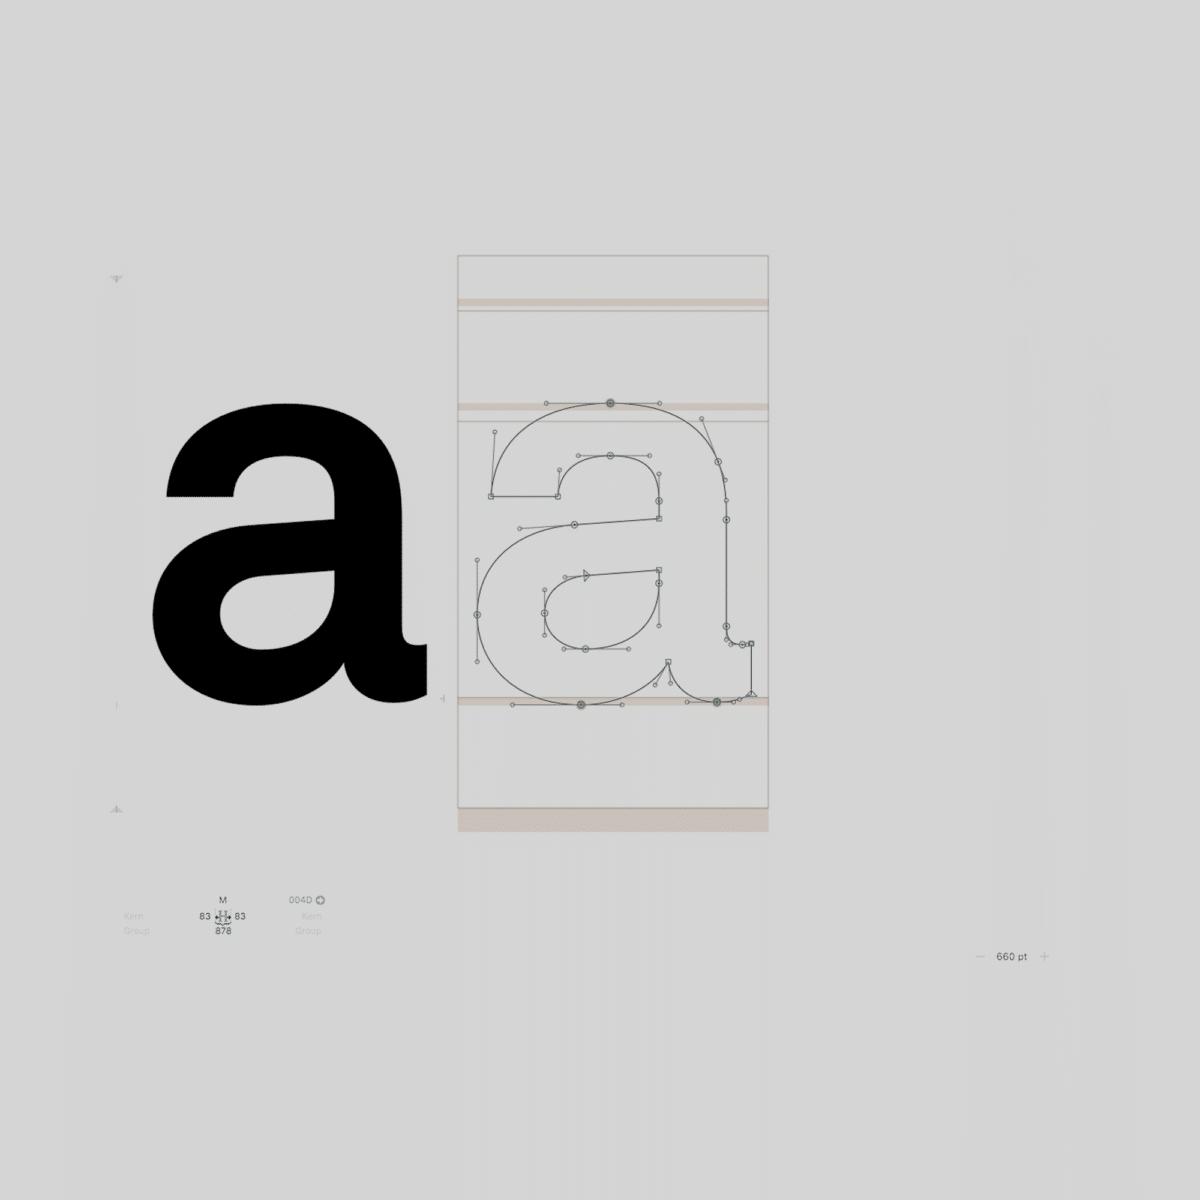 Work In Progress — Type.a.#graphics #design #agencylife #graphicdesigner #graphicdesign #igers #igersoftheday #designer #graphicdesign #art #artdirection  #grafik #Branding #brandingagency #Brand #grey #type #typeography #font #typography